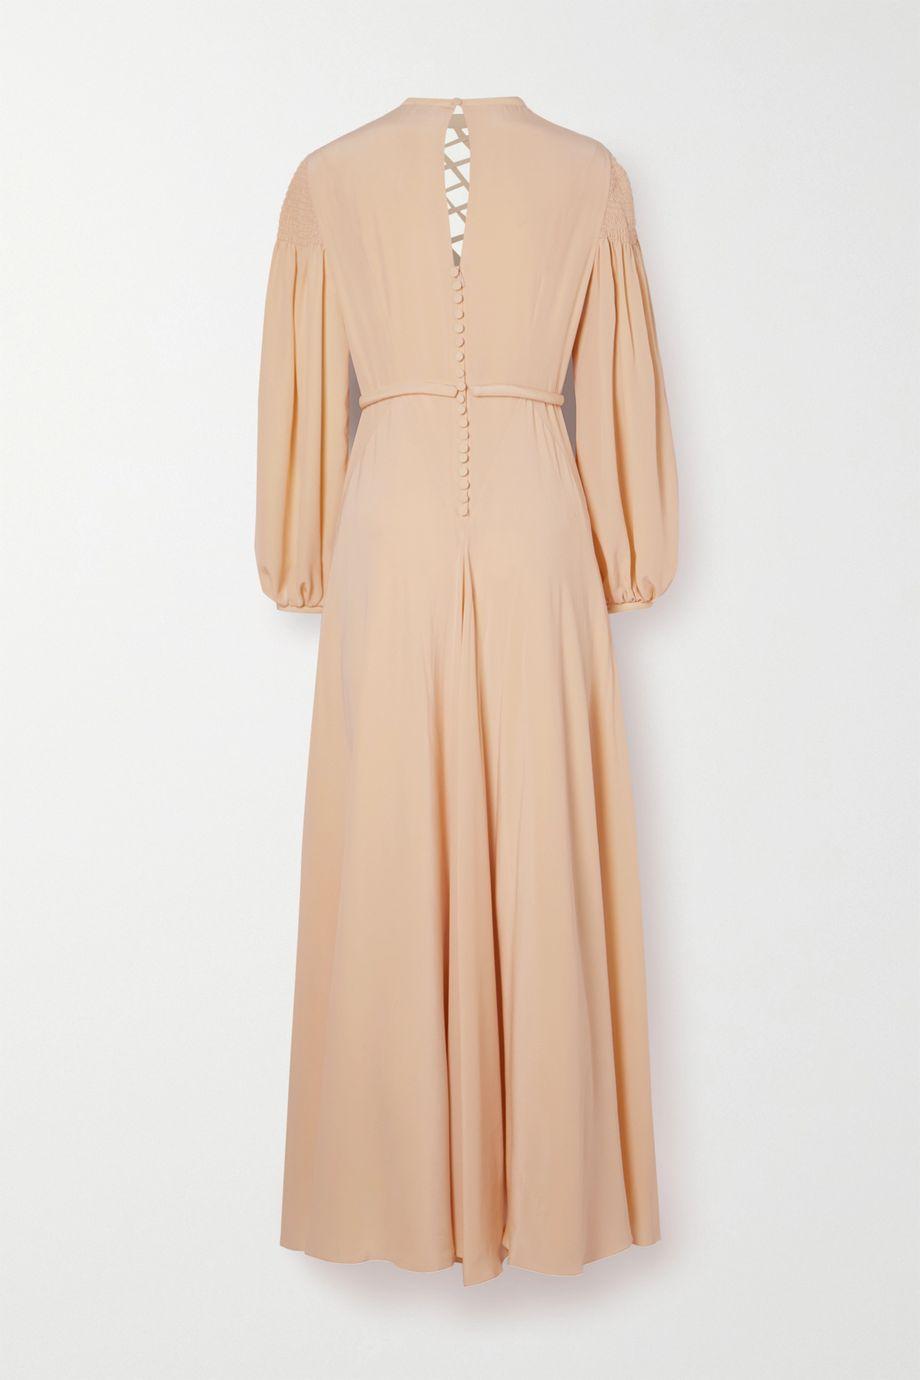 Fendi Cutout silk crepe de chine gown